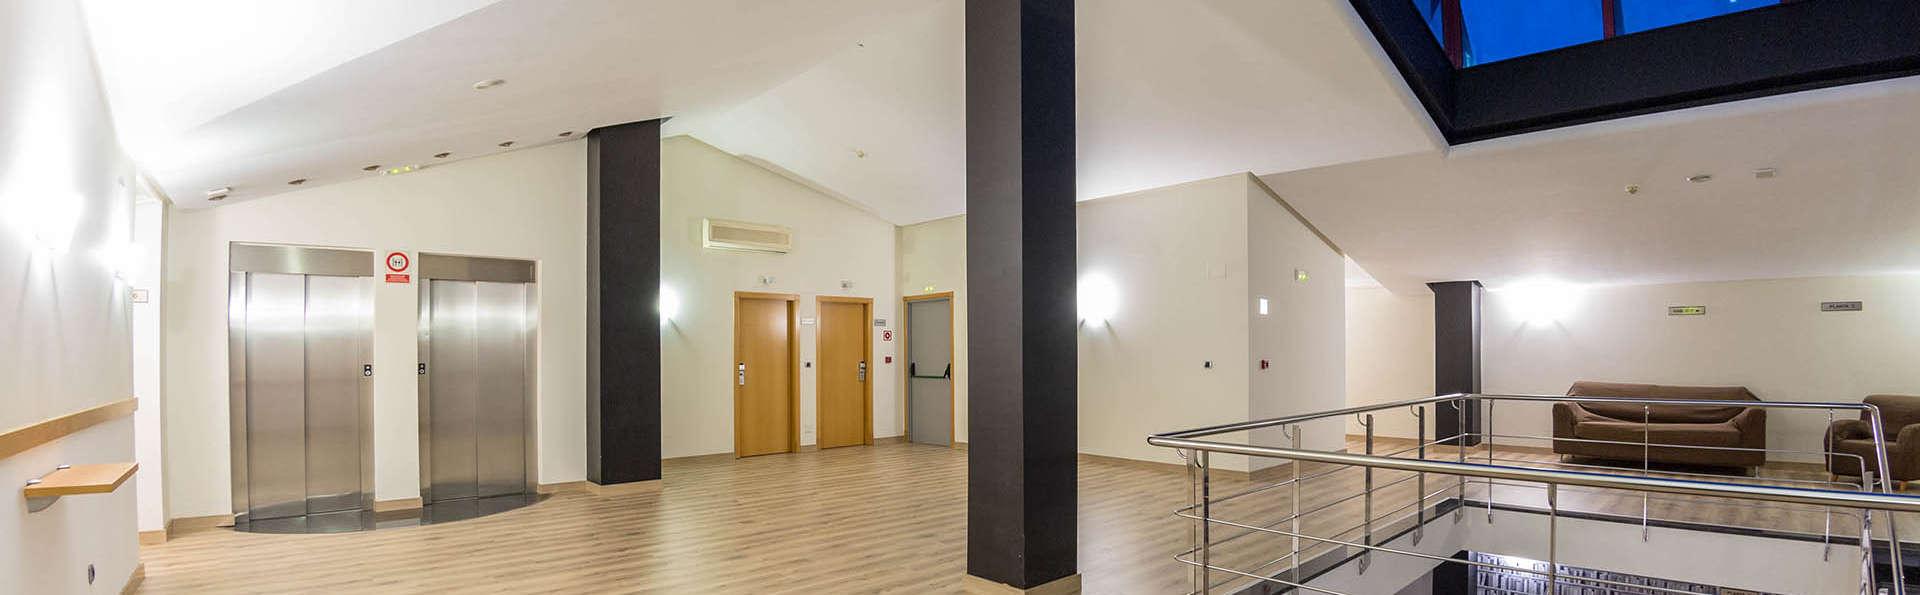 Hotel Alfonso I - EDIT_Zonas_Comunes_Hotel_Alfonso_I_H_01.jpg